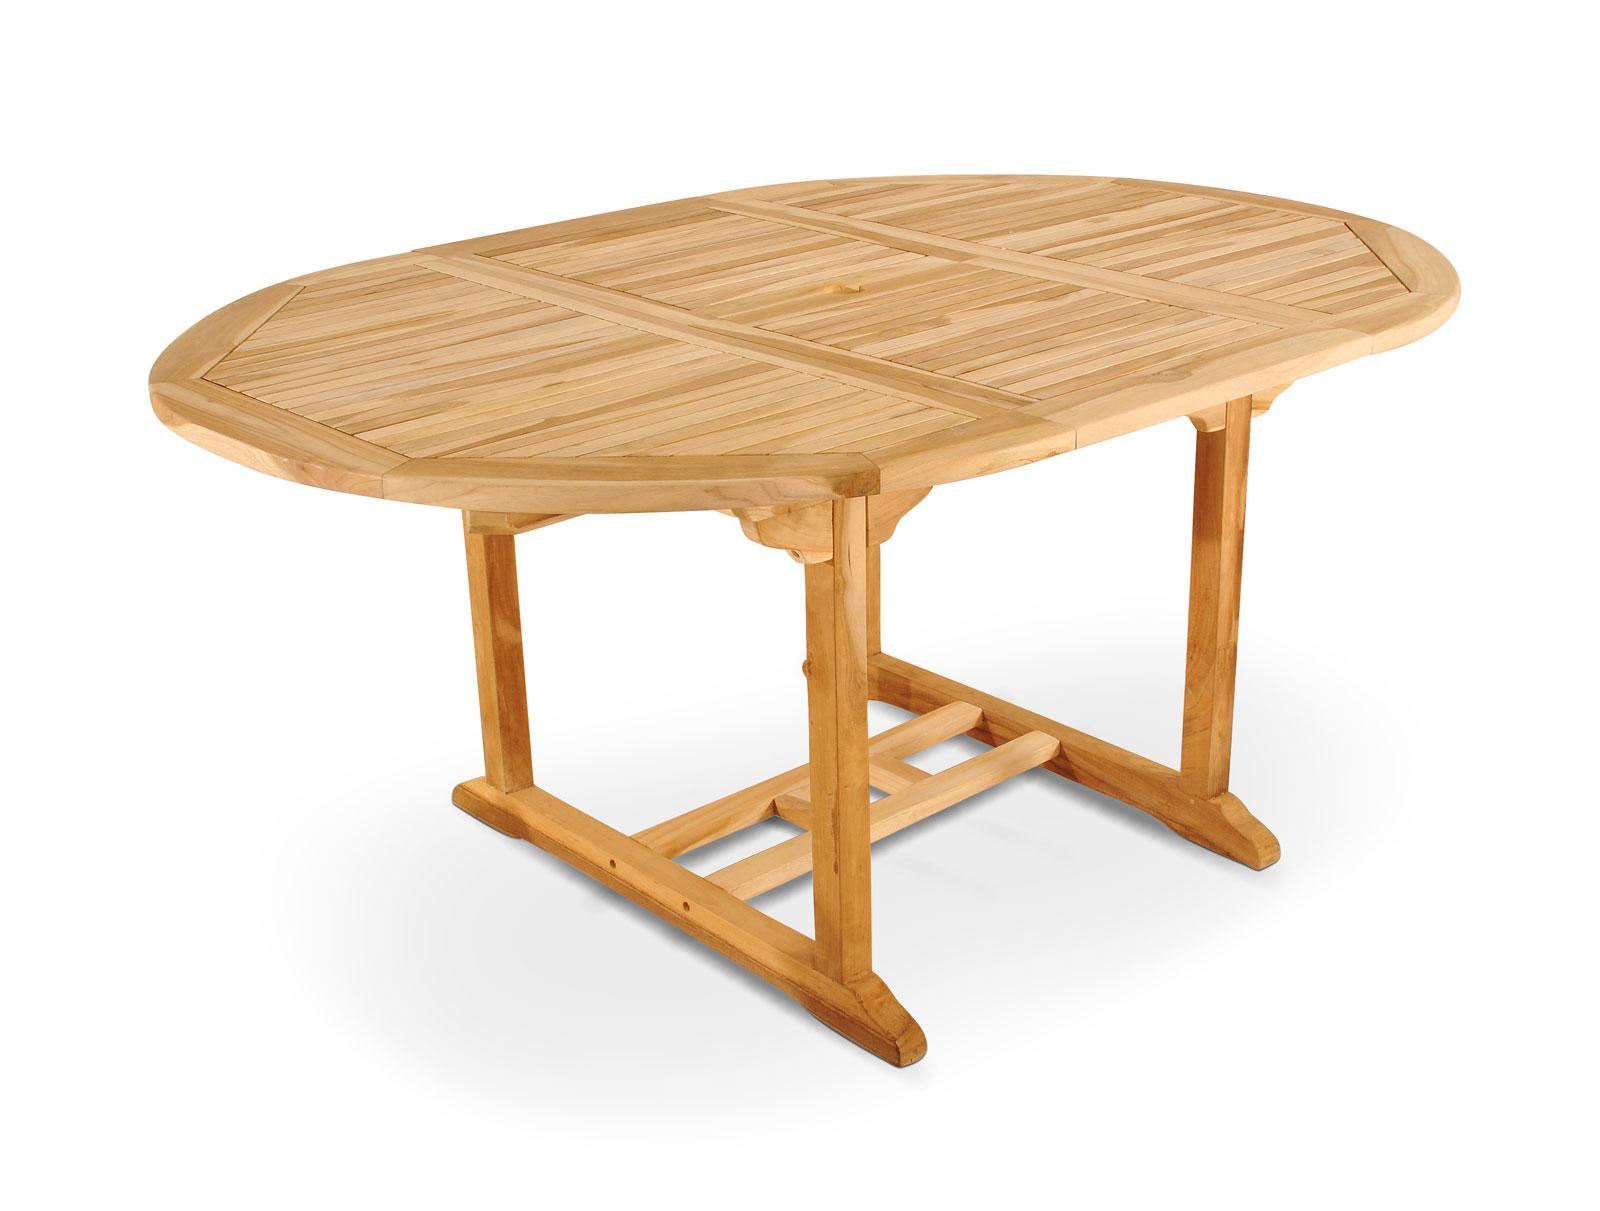 Sam Teak Gartenmobel Set 6tlg Tisch 120 170 Cm Gartenbank 150 Cm Ba